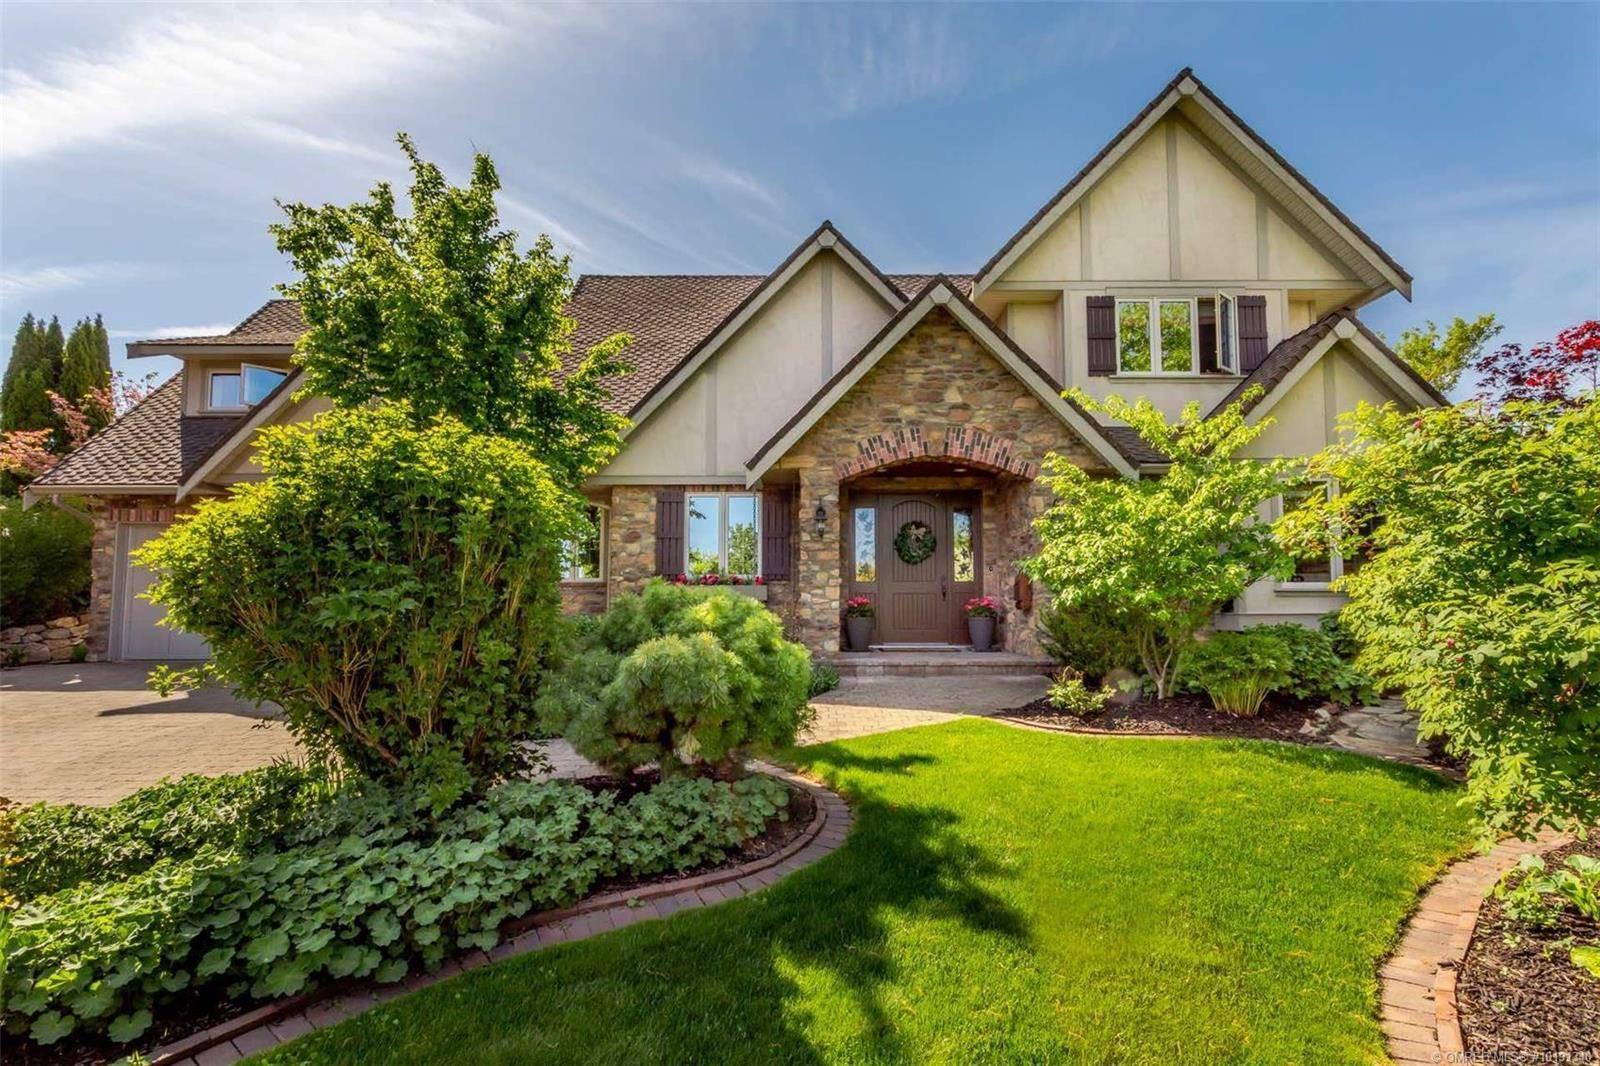 House for sale at 4893 Parkridge Pl Kelowna British Columbia - MLS: 10191340